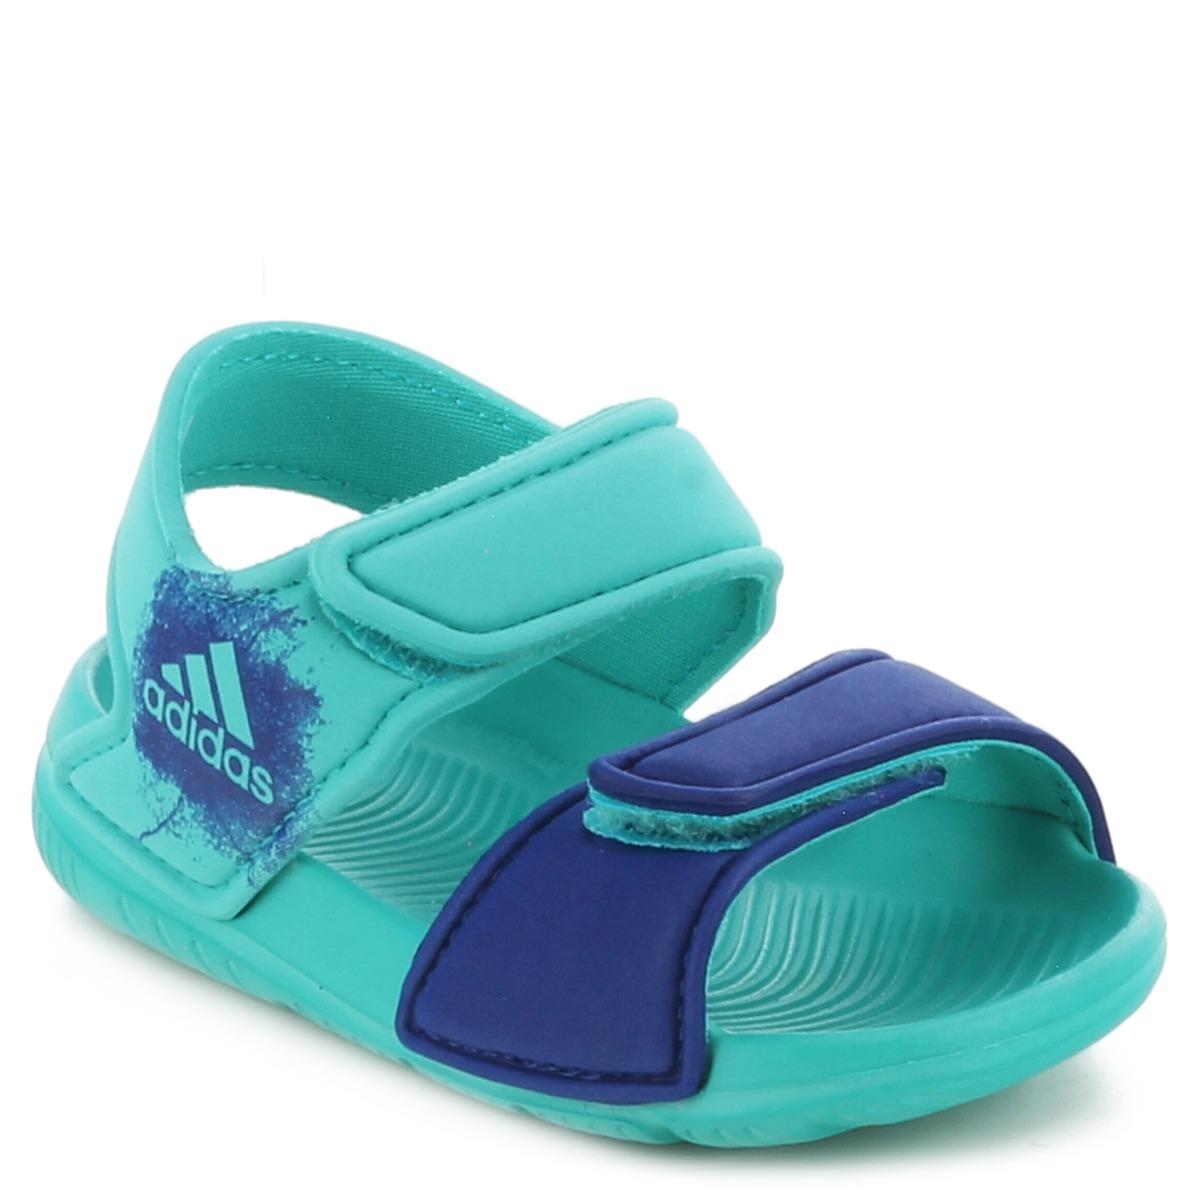 bedb5e817 sandalia niño adidas sandalia swim 009.436405548. Cargando zoom.